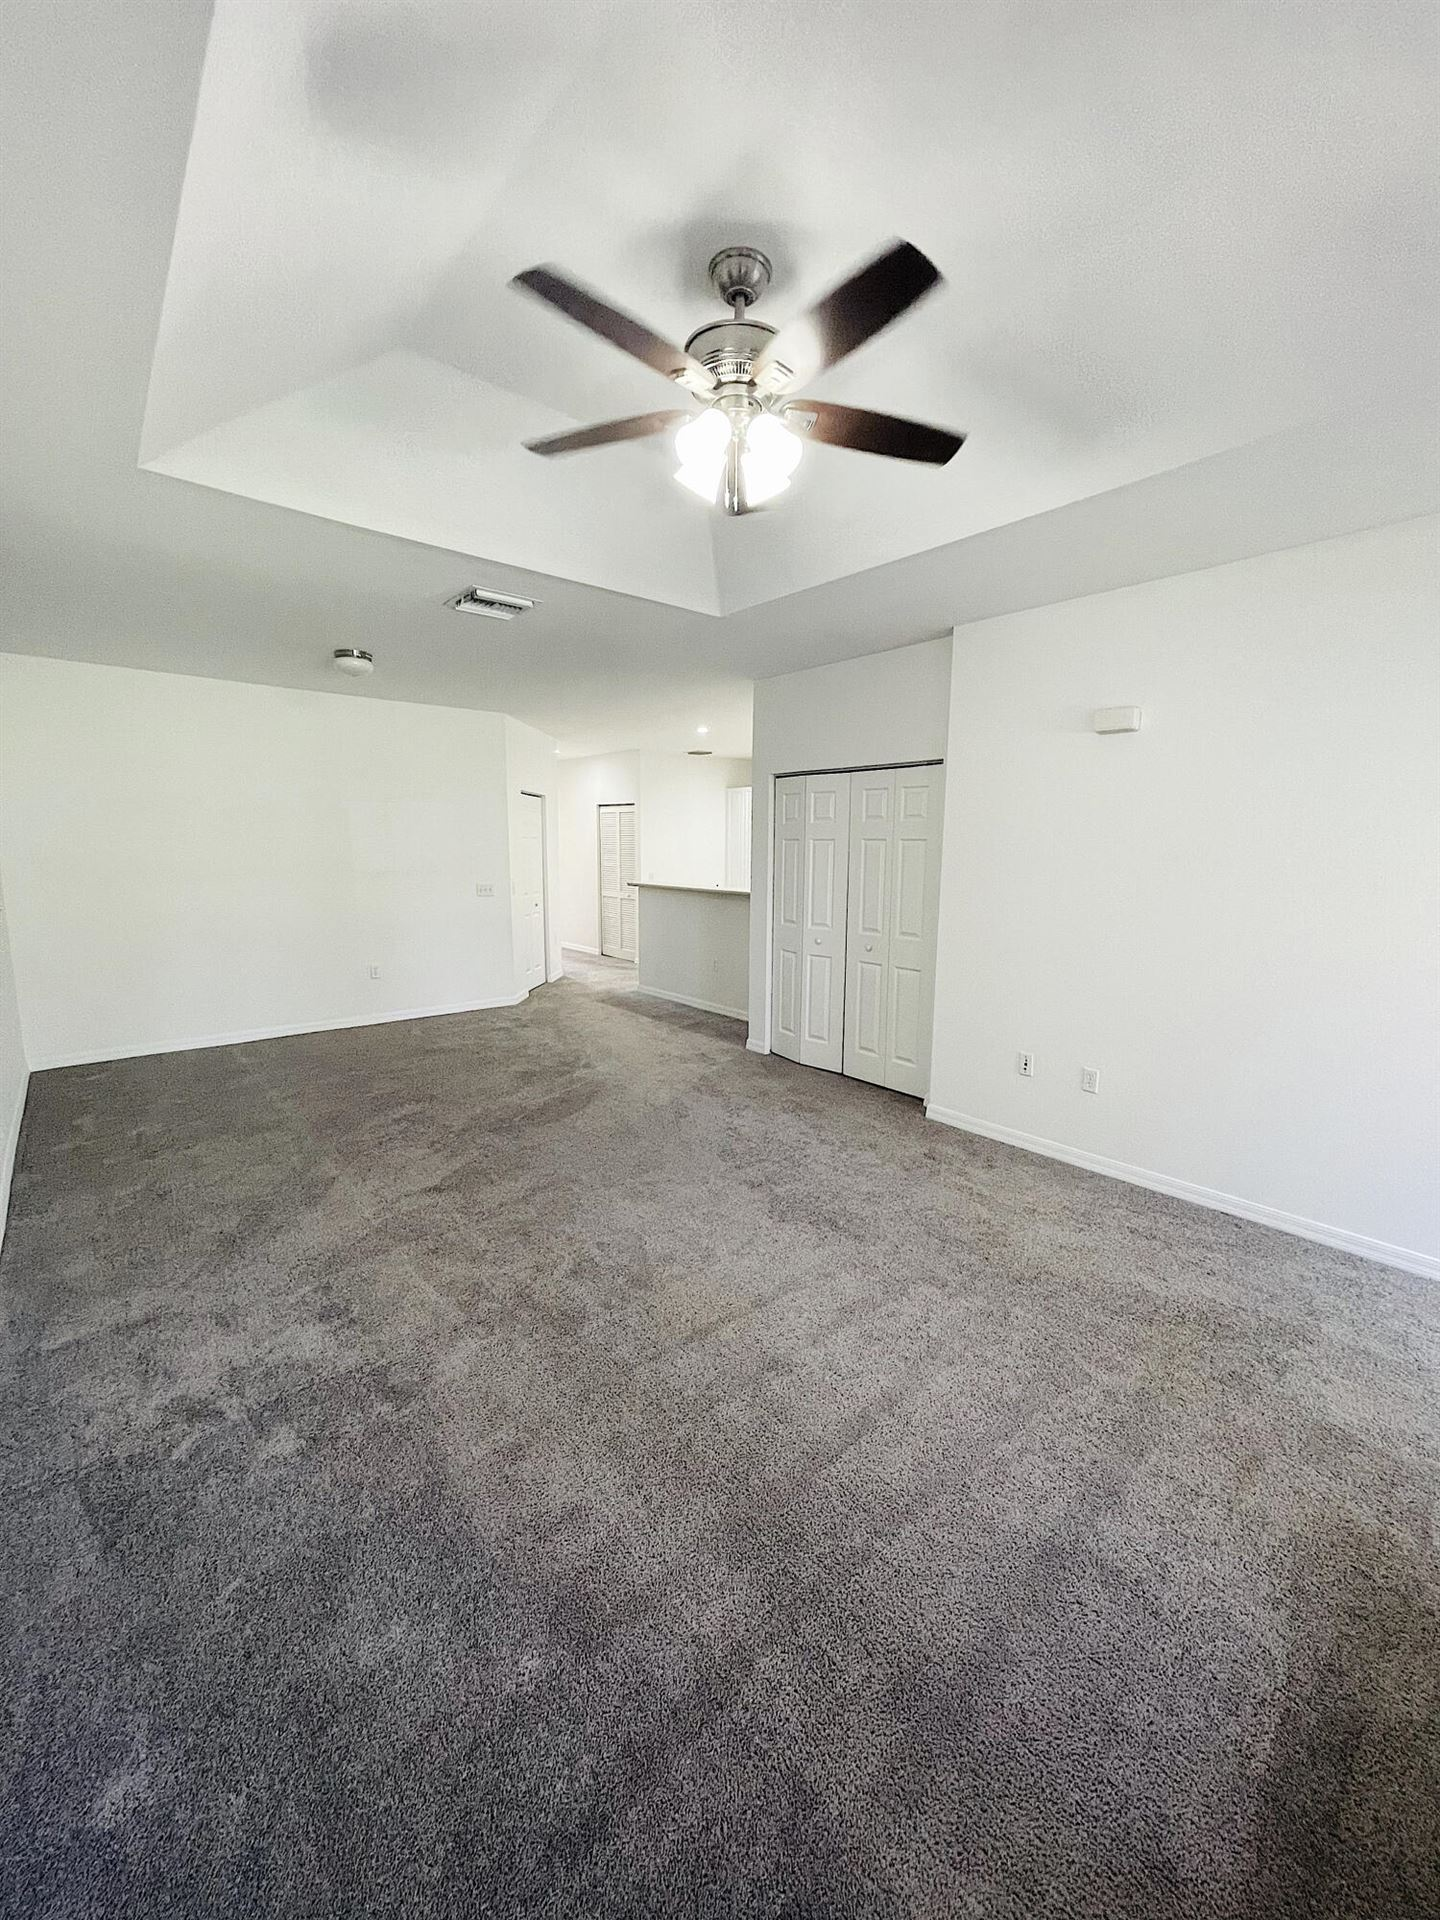 Photo of 1797 Lakefront Boulevard, Fort Pierce, FL 34982 (MLS # RX-10754844)